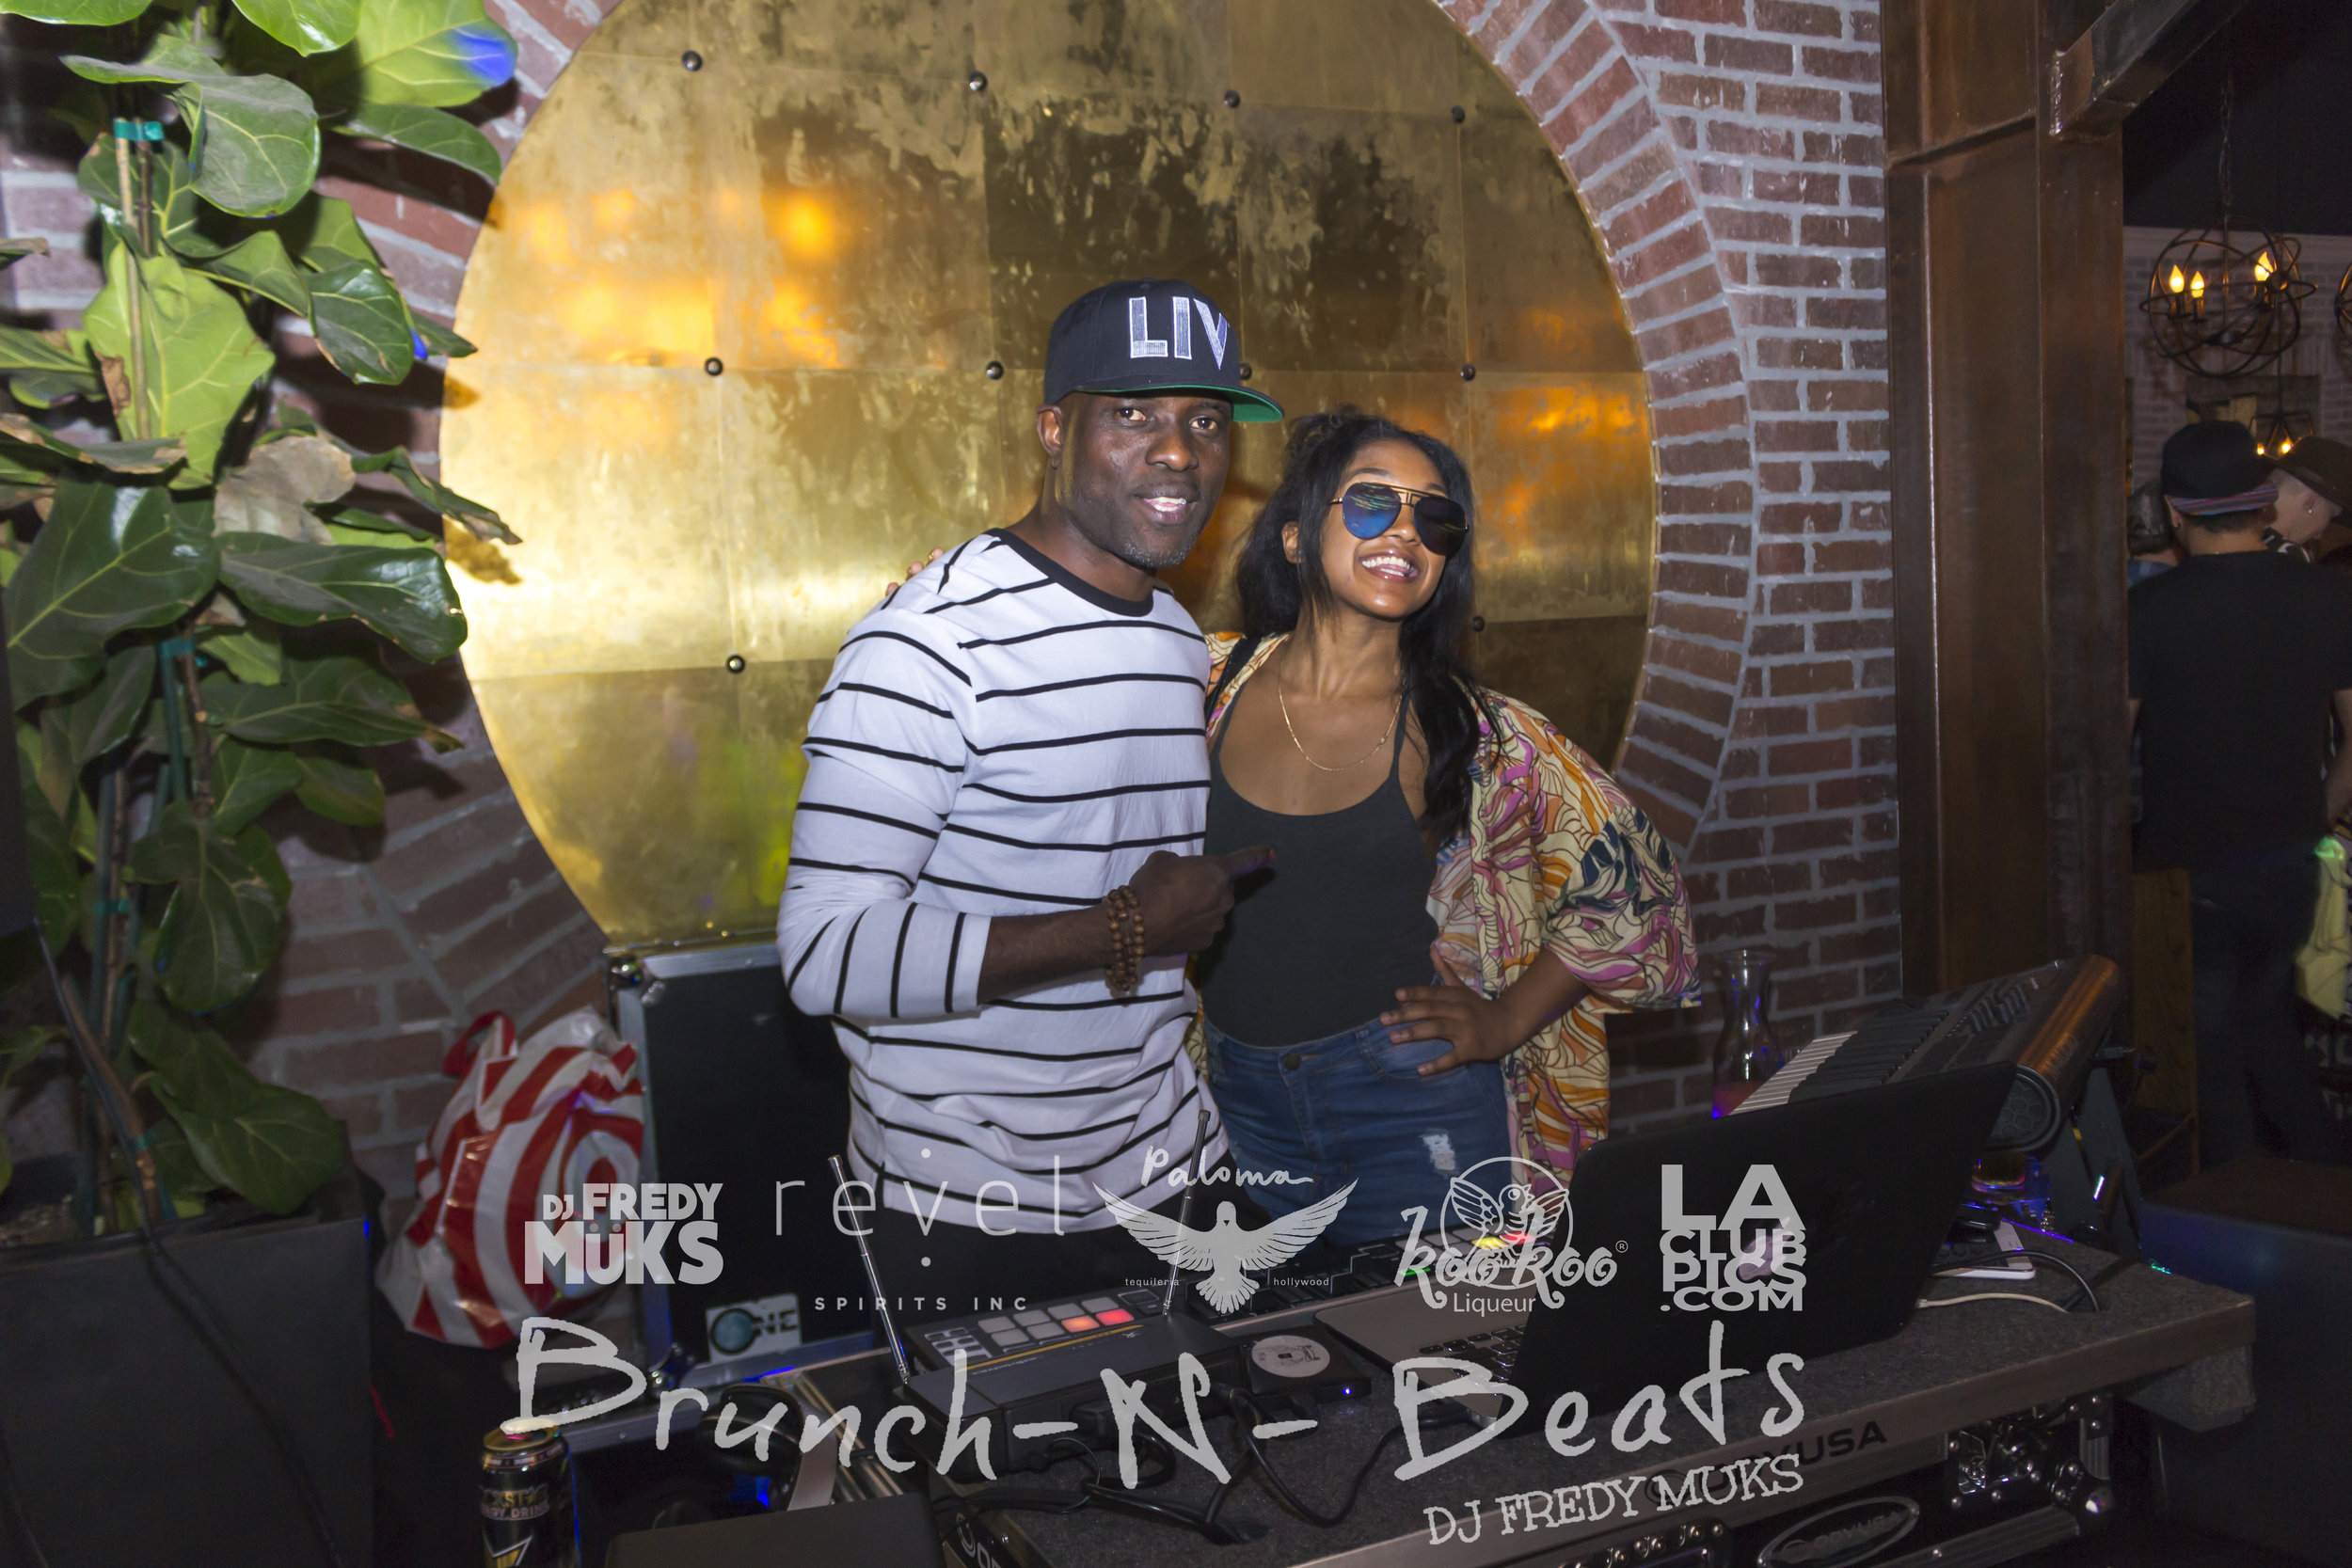 Brunch-N-Beats - Paloma Hollywood - 02-25-18_144.jpg